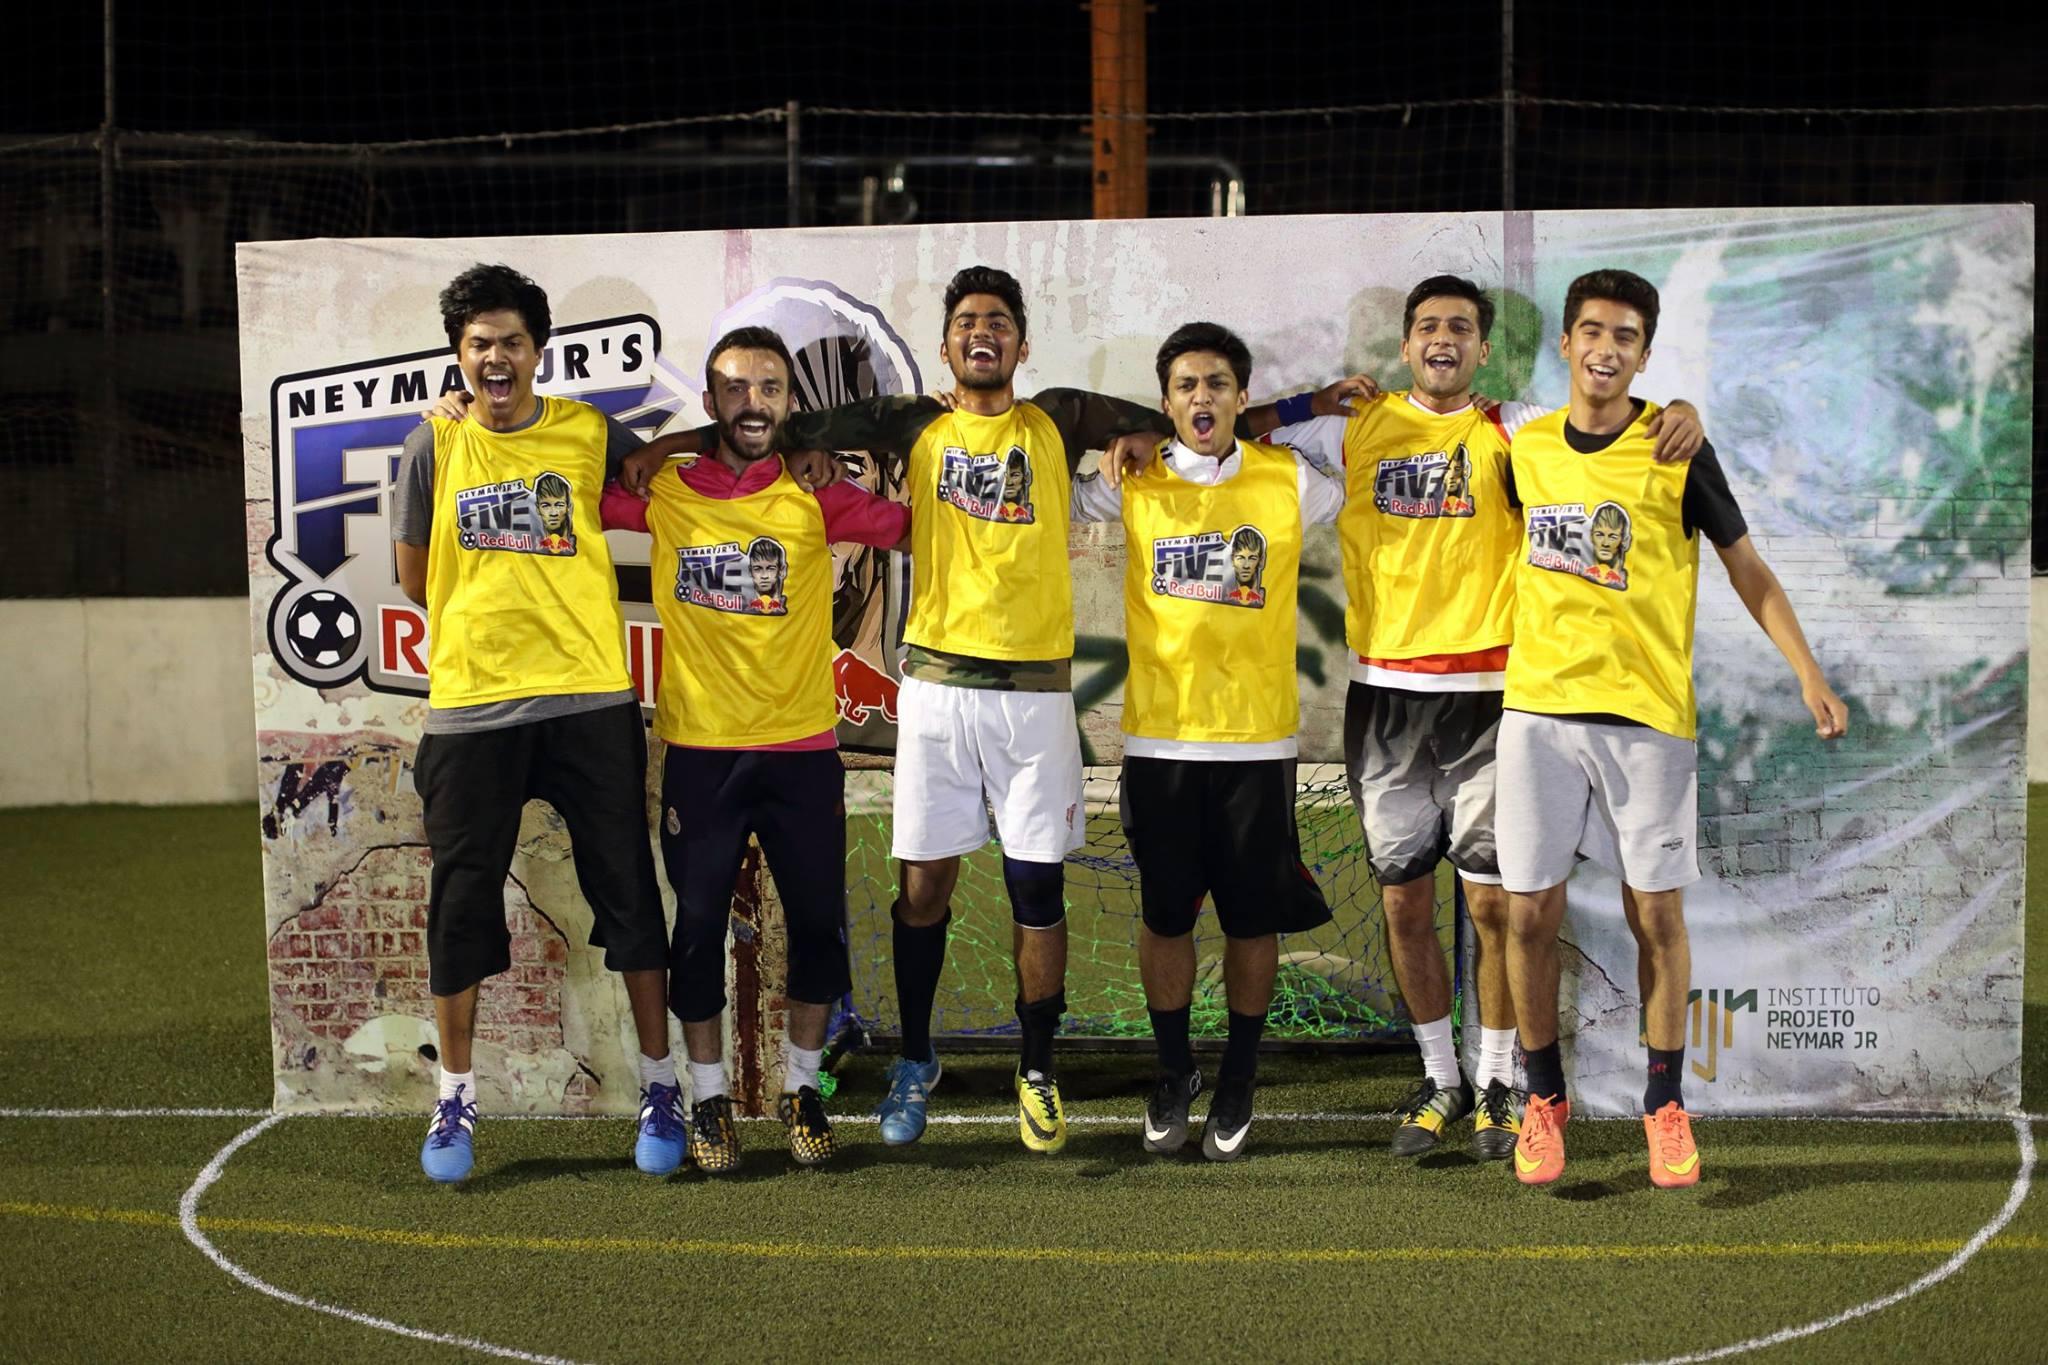 Ghosts FC make Neymar Jr's Five world finals [Dawn]